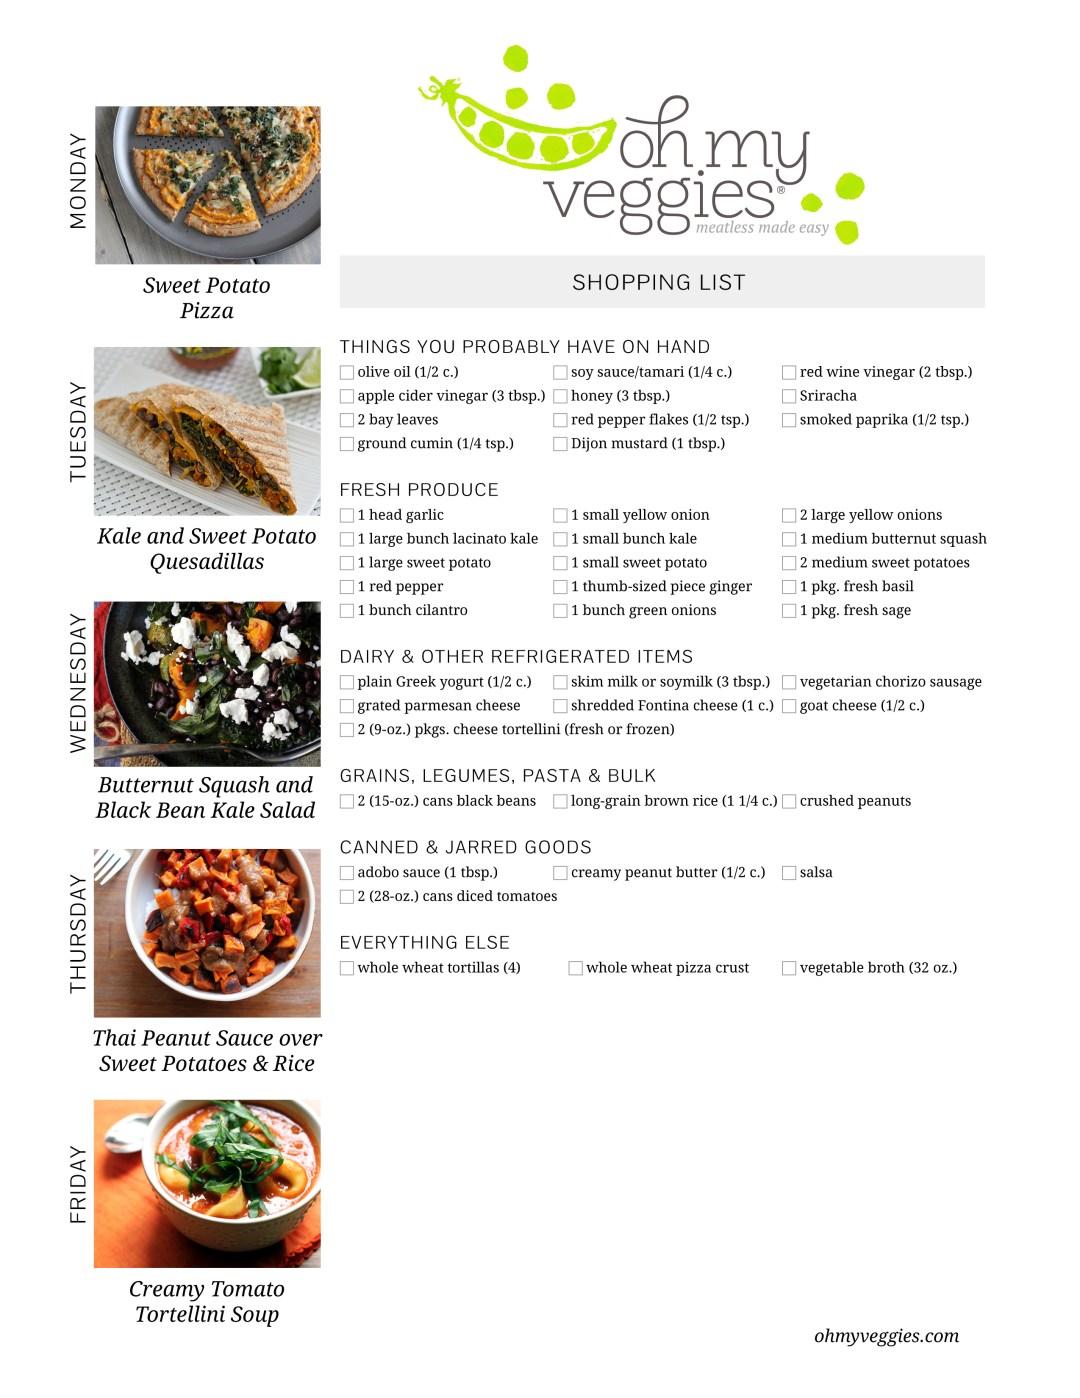 Vegetarian Meal Plan & Shopping List - 10.13.14